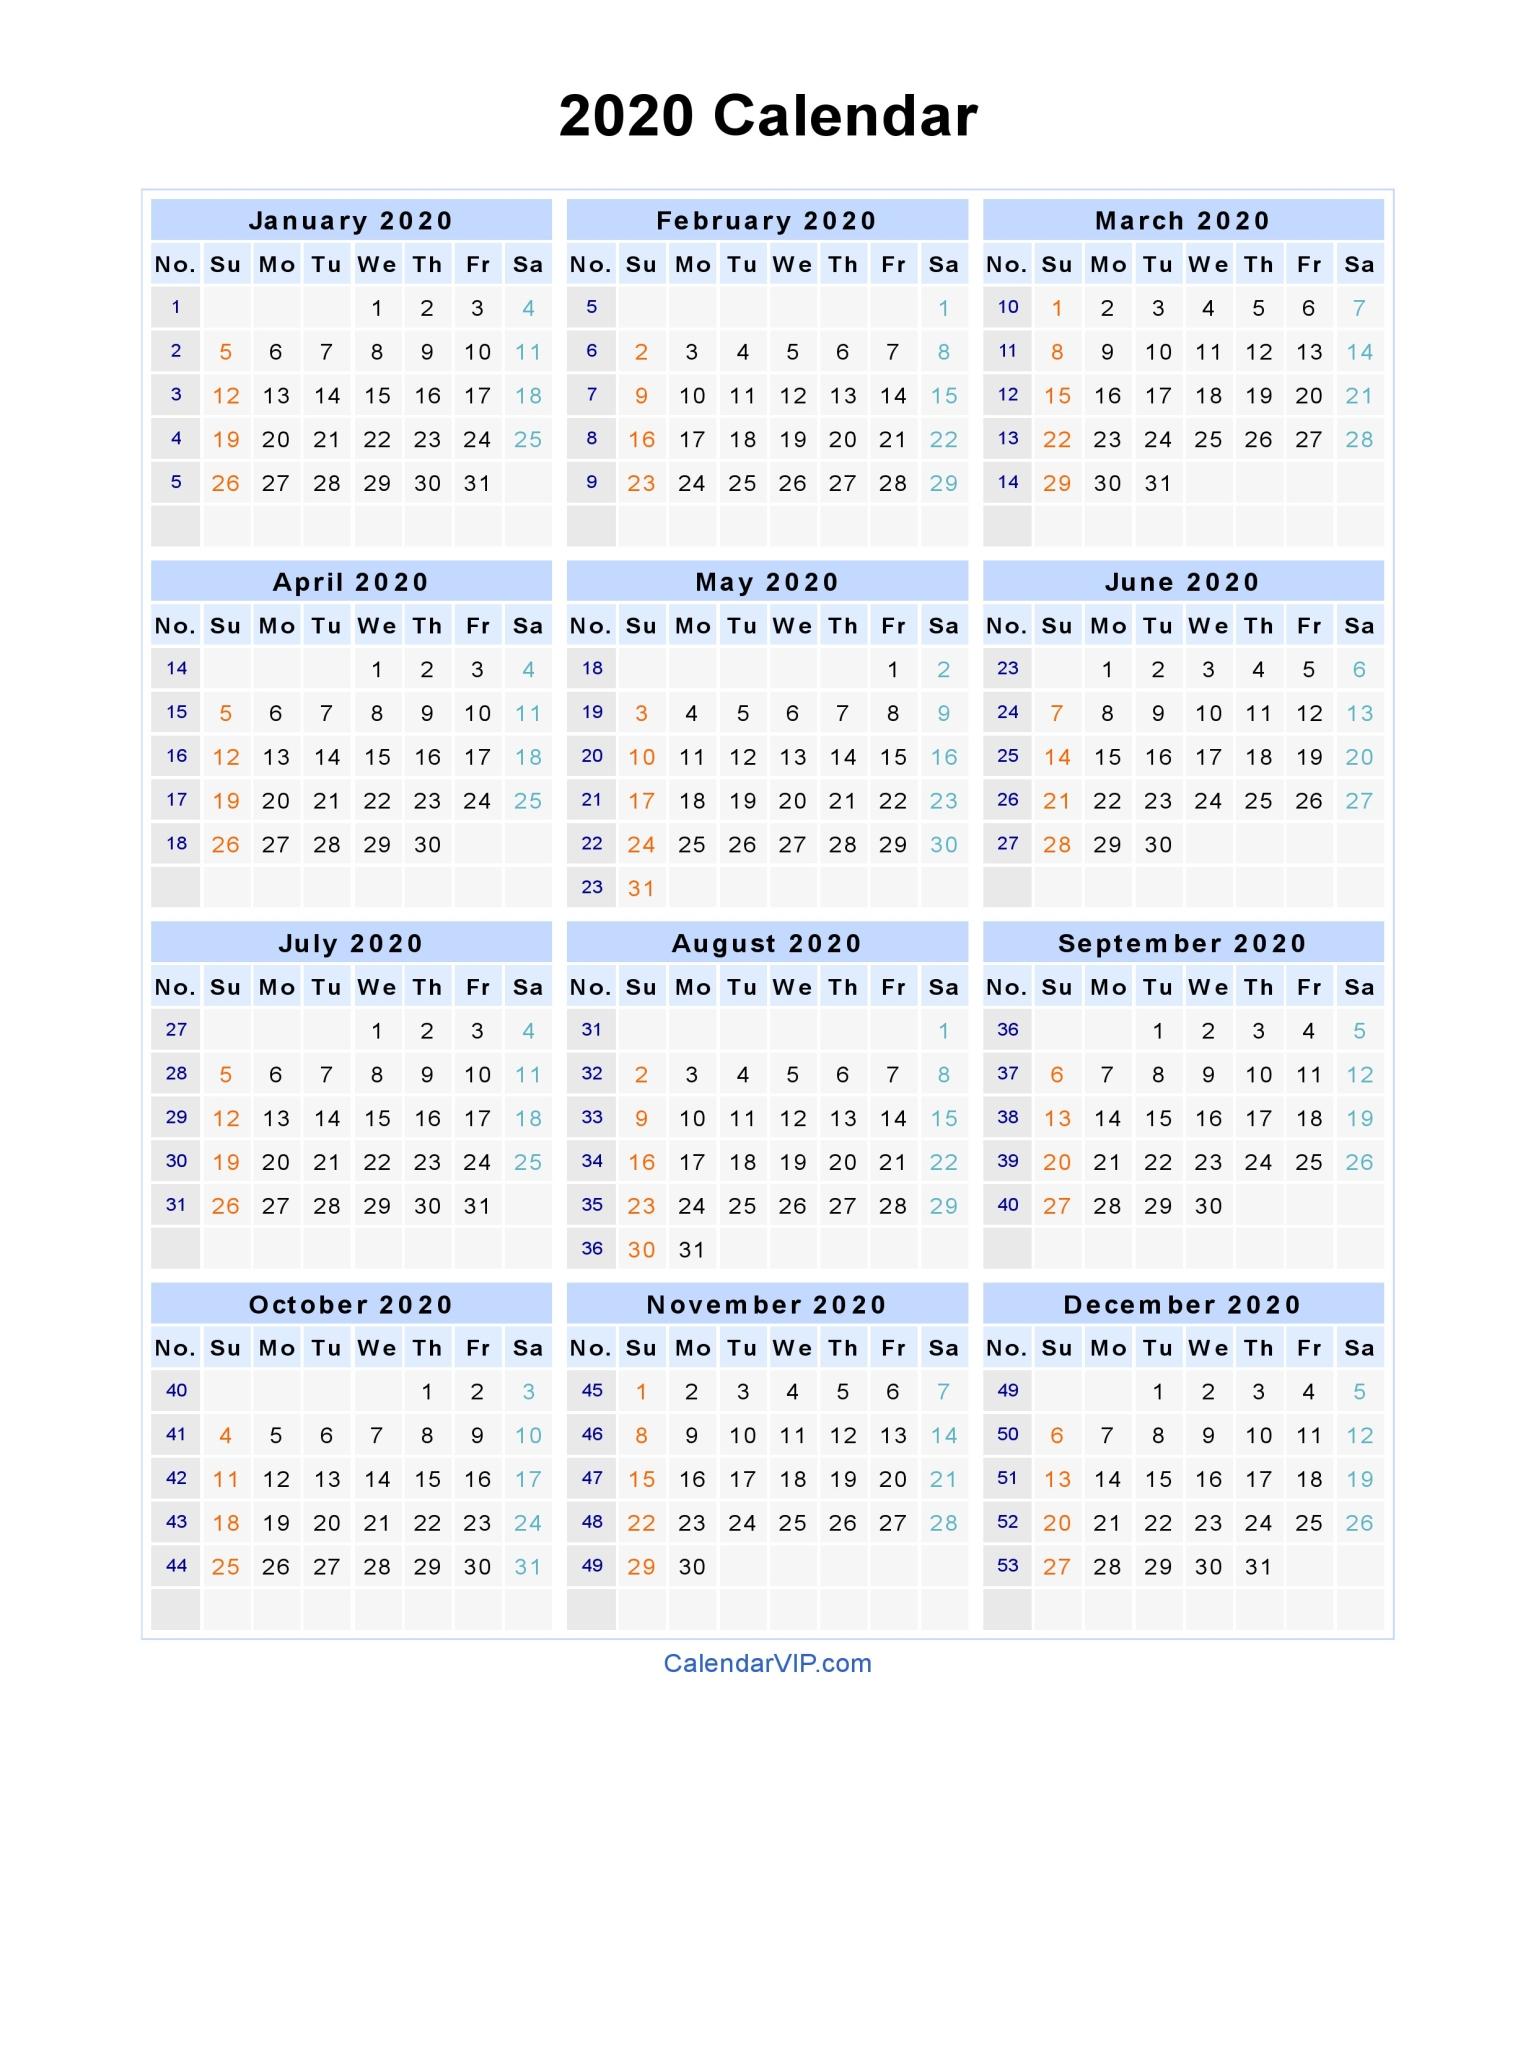 2020 Calendar Uk Printable - Wpa.wpart.co